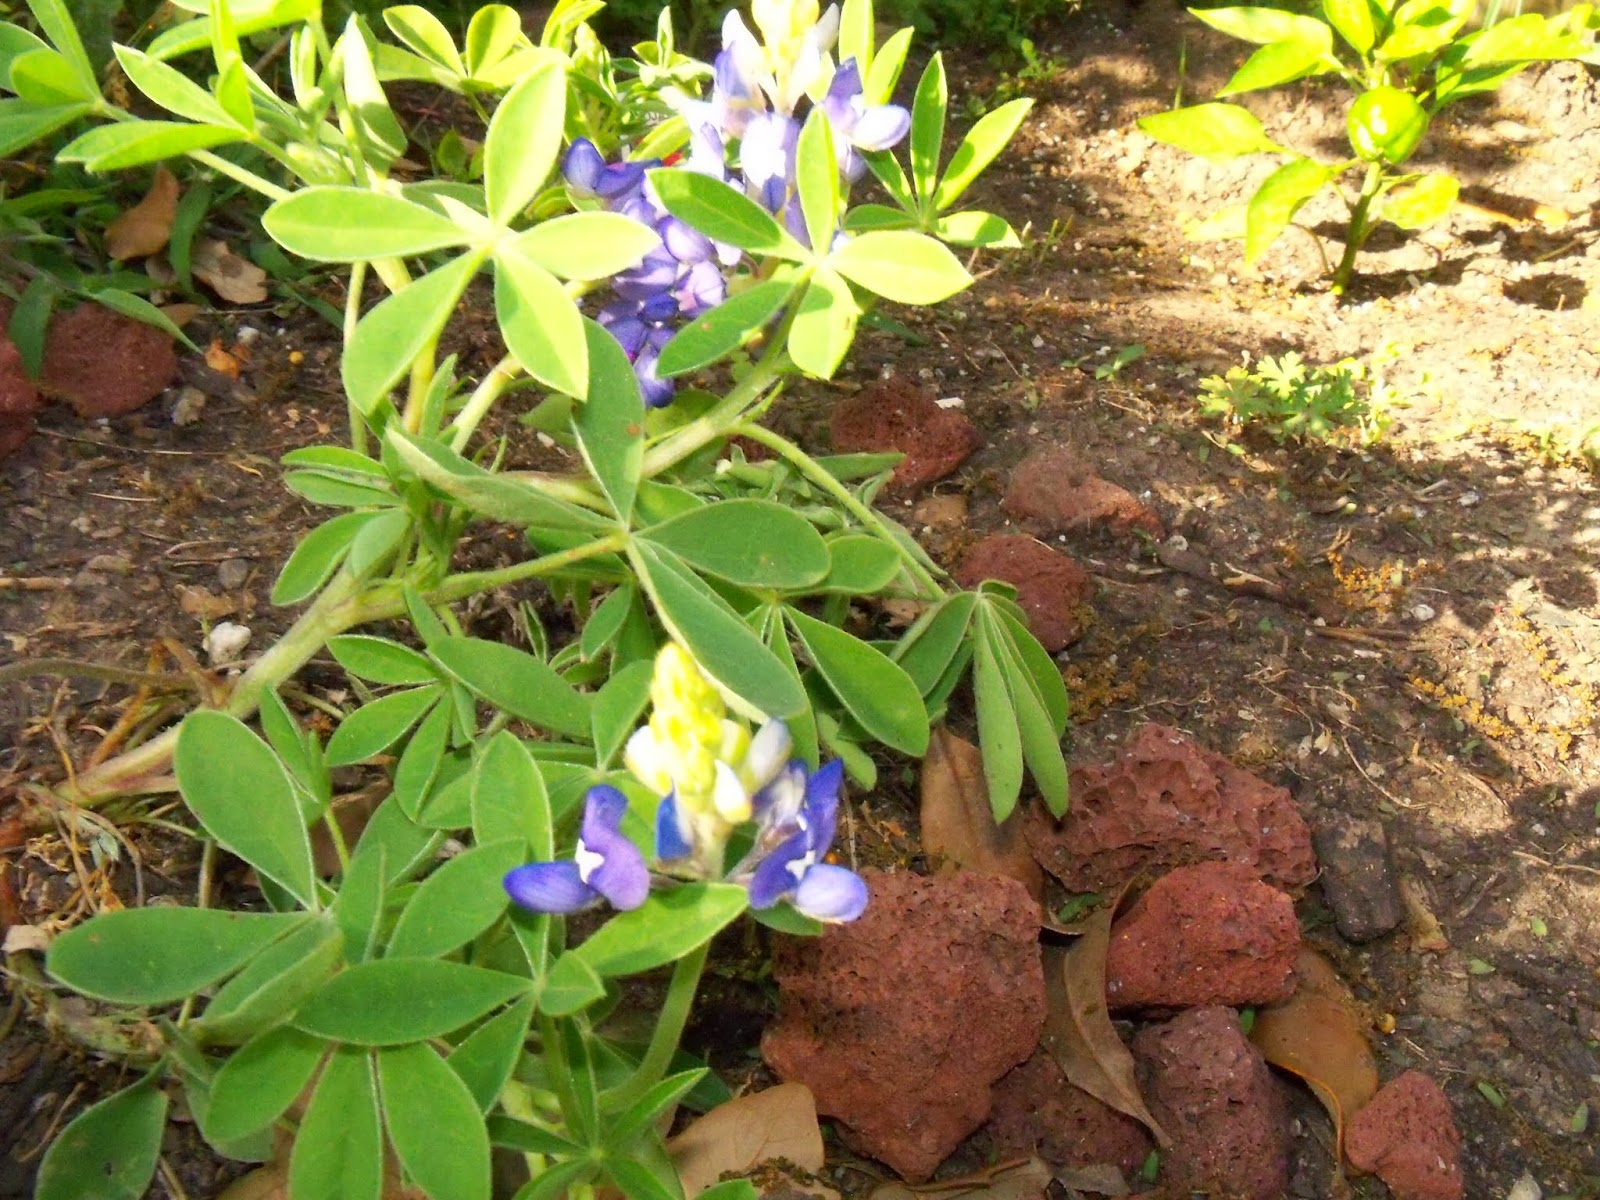 Gardening 2015 - 116_7677.JPG